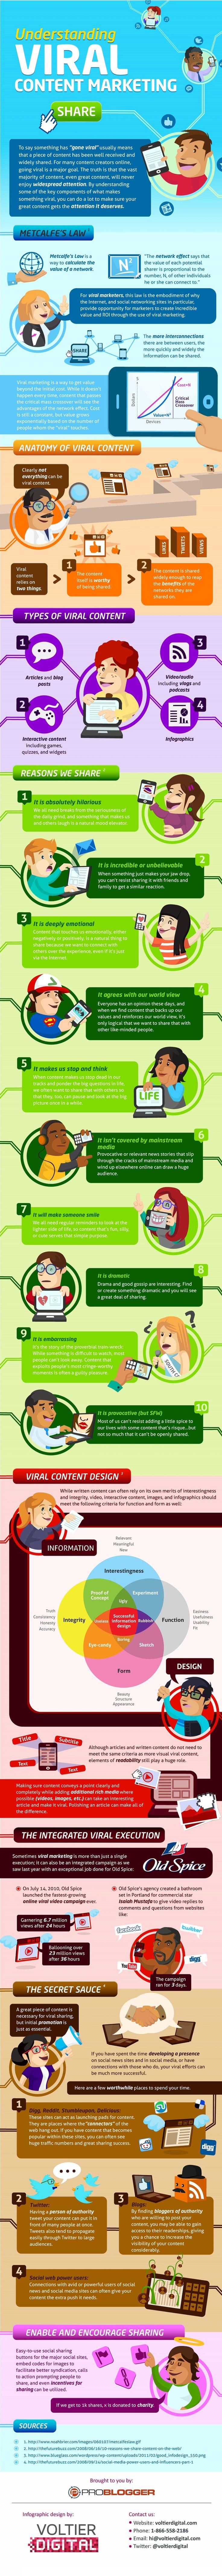 Understanding viral #content #marketing